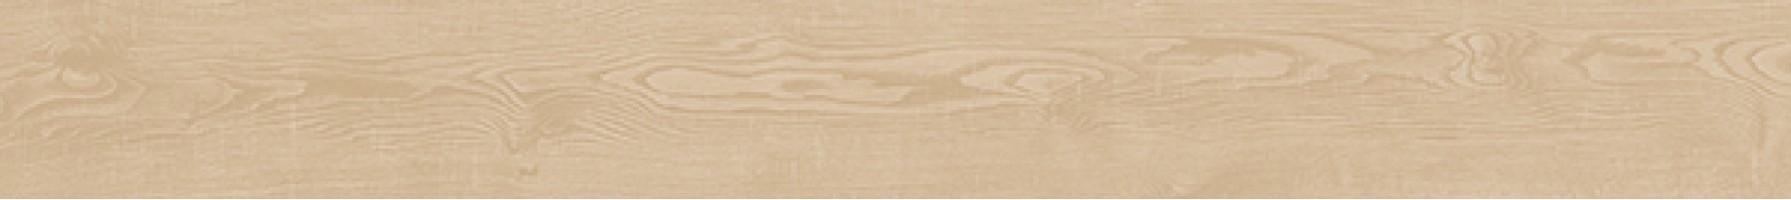 Керамогранит Porcelanosa Chelsea Arce 19.3x180 P16700101